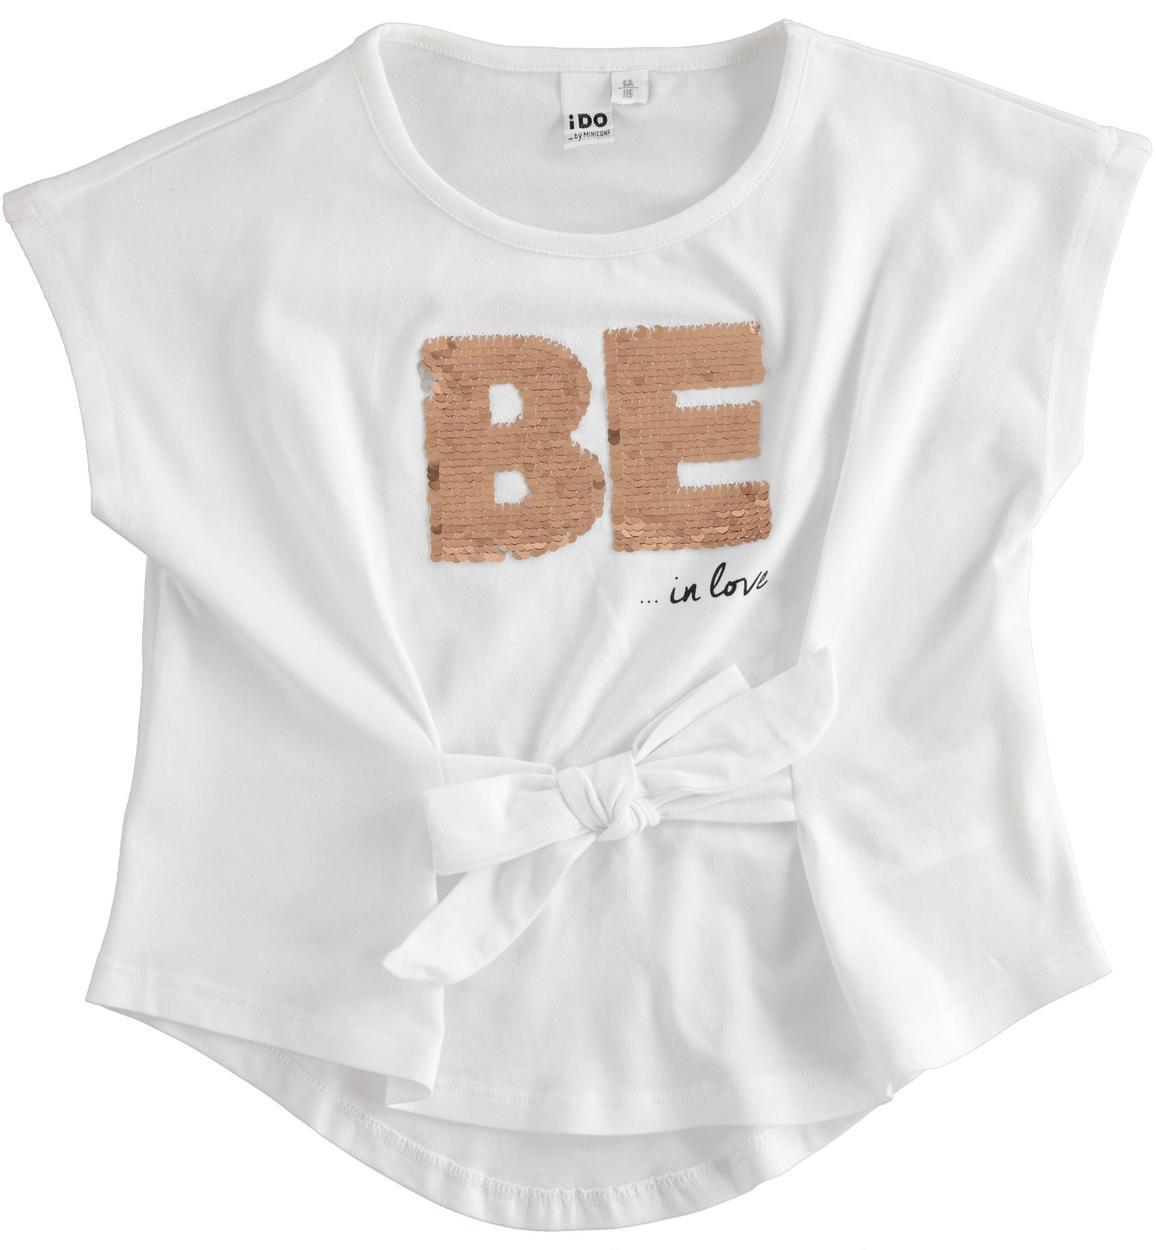 particolare tshirt con lunghezze asimme bianco retro 02 2474j49500 0113